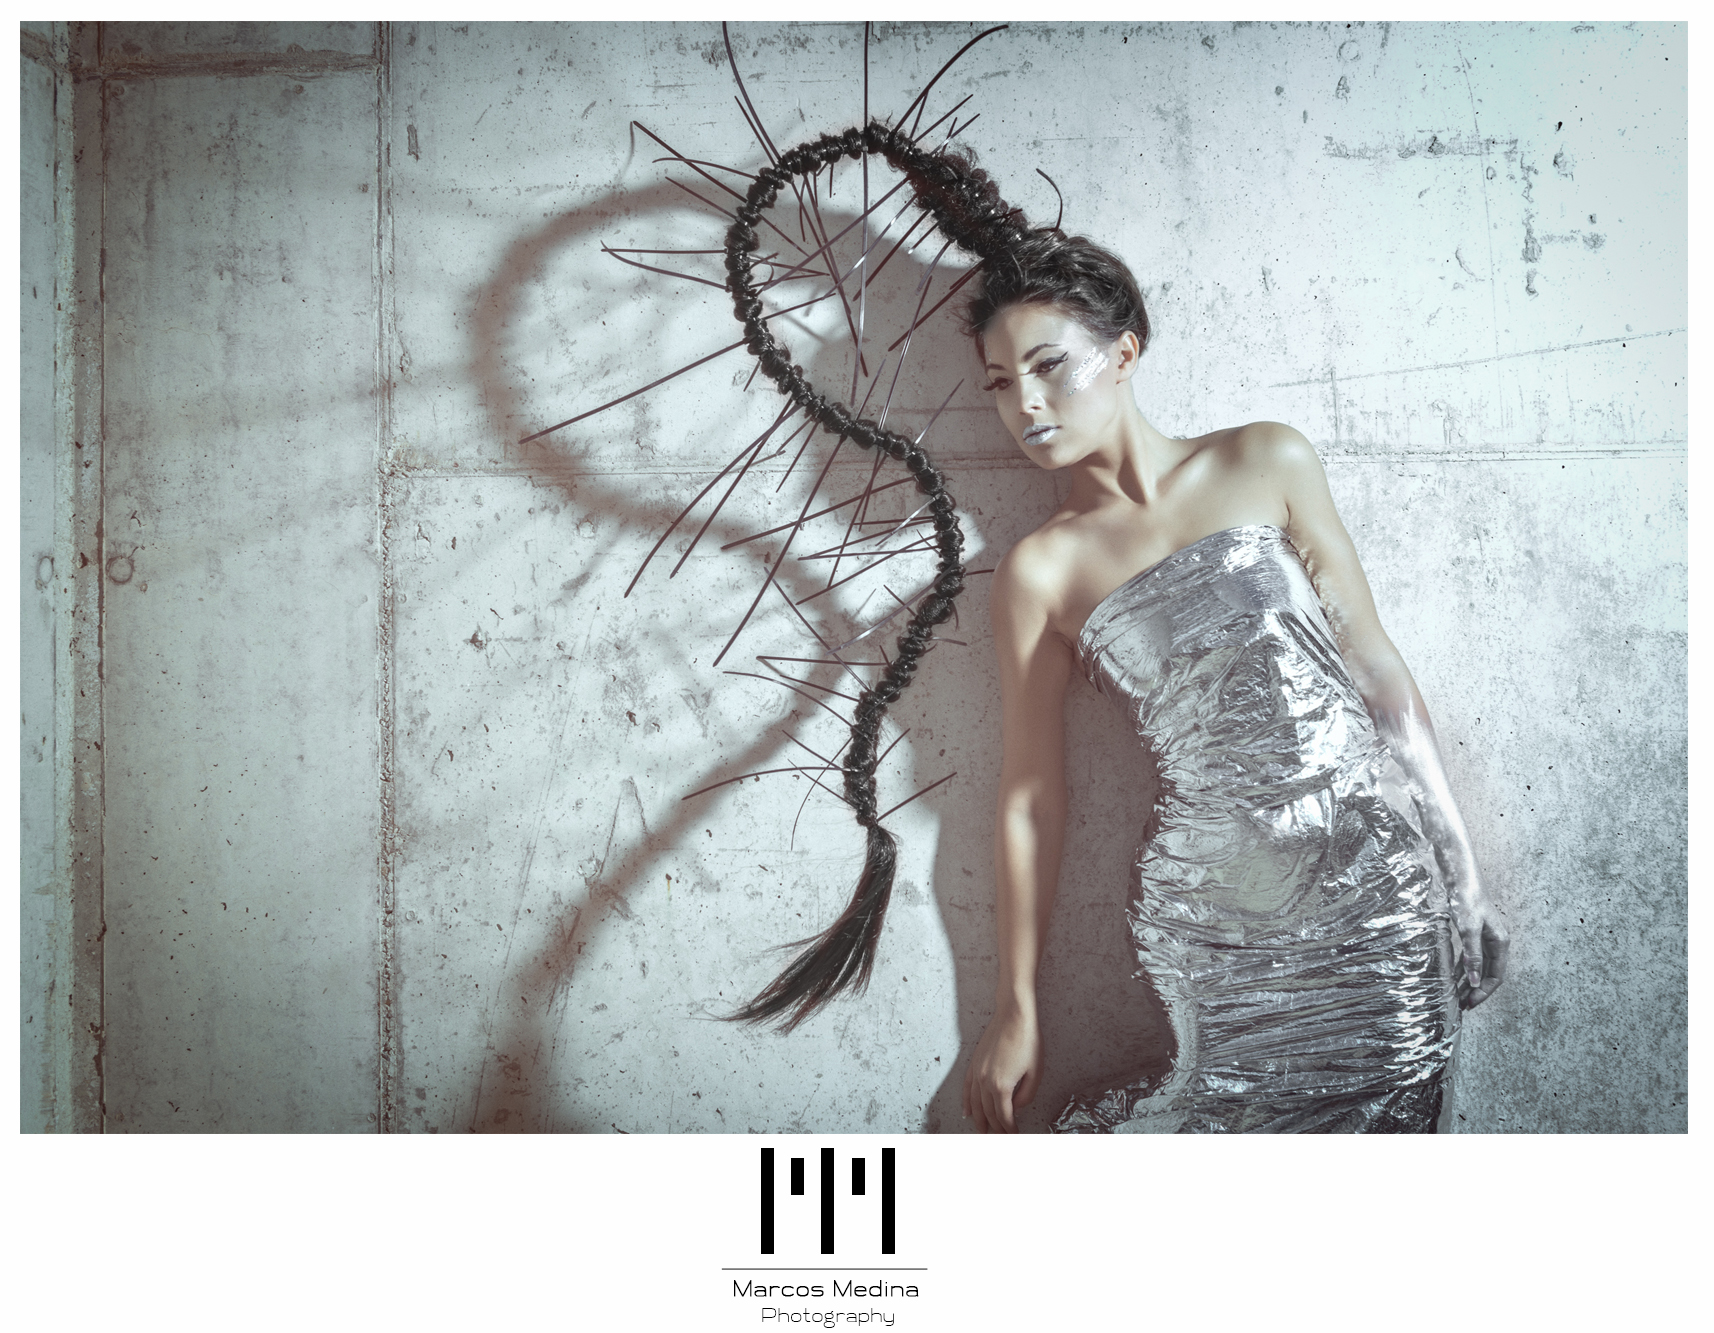 Marcos_Medina_Photography_Fashion_Futurista_5